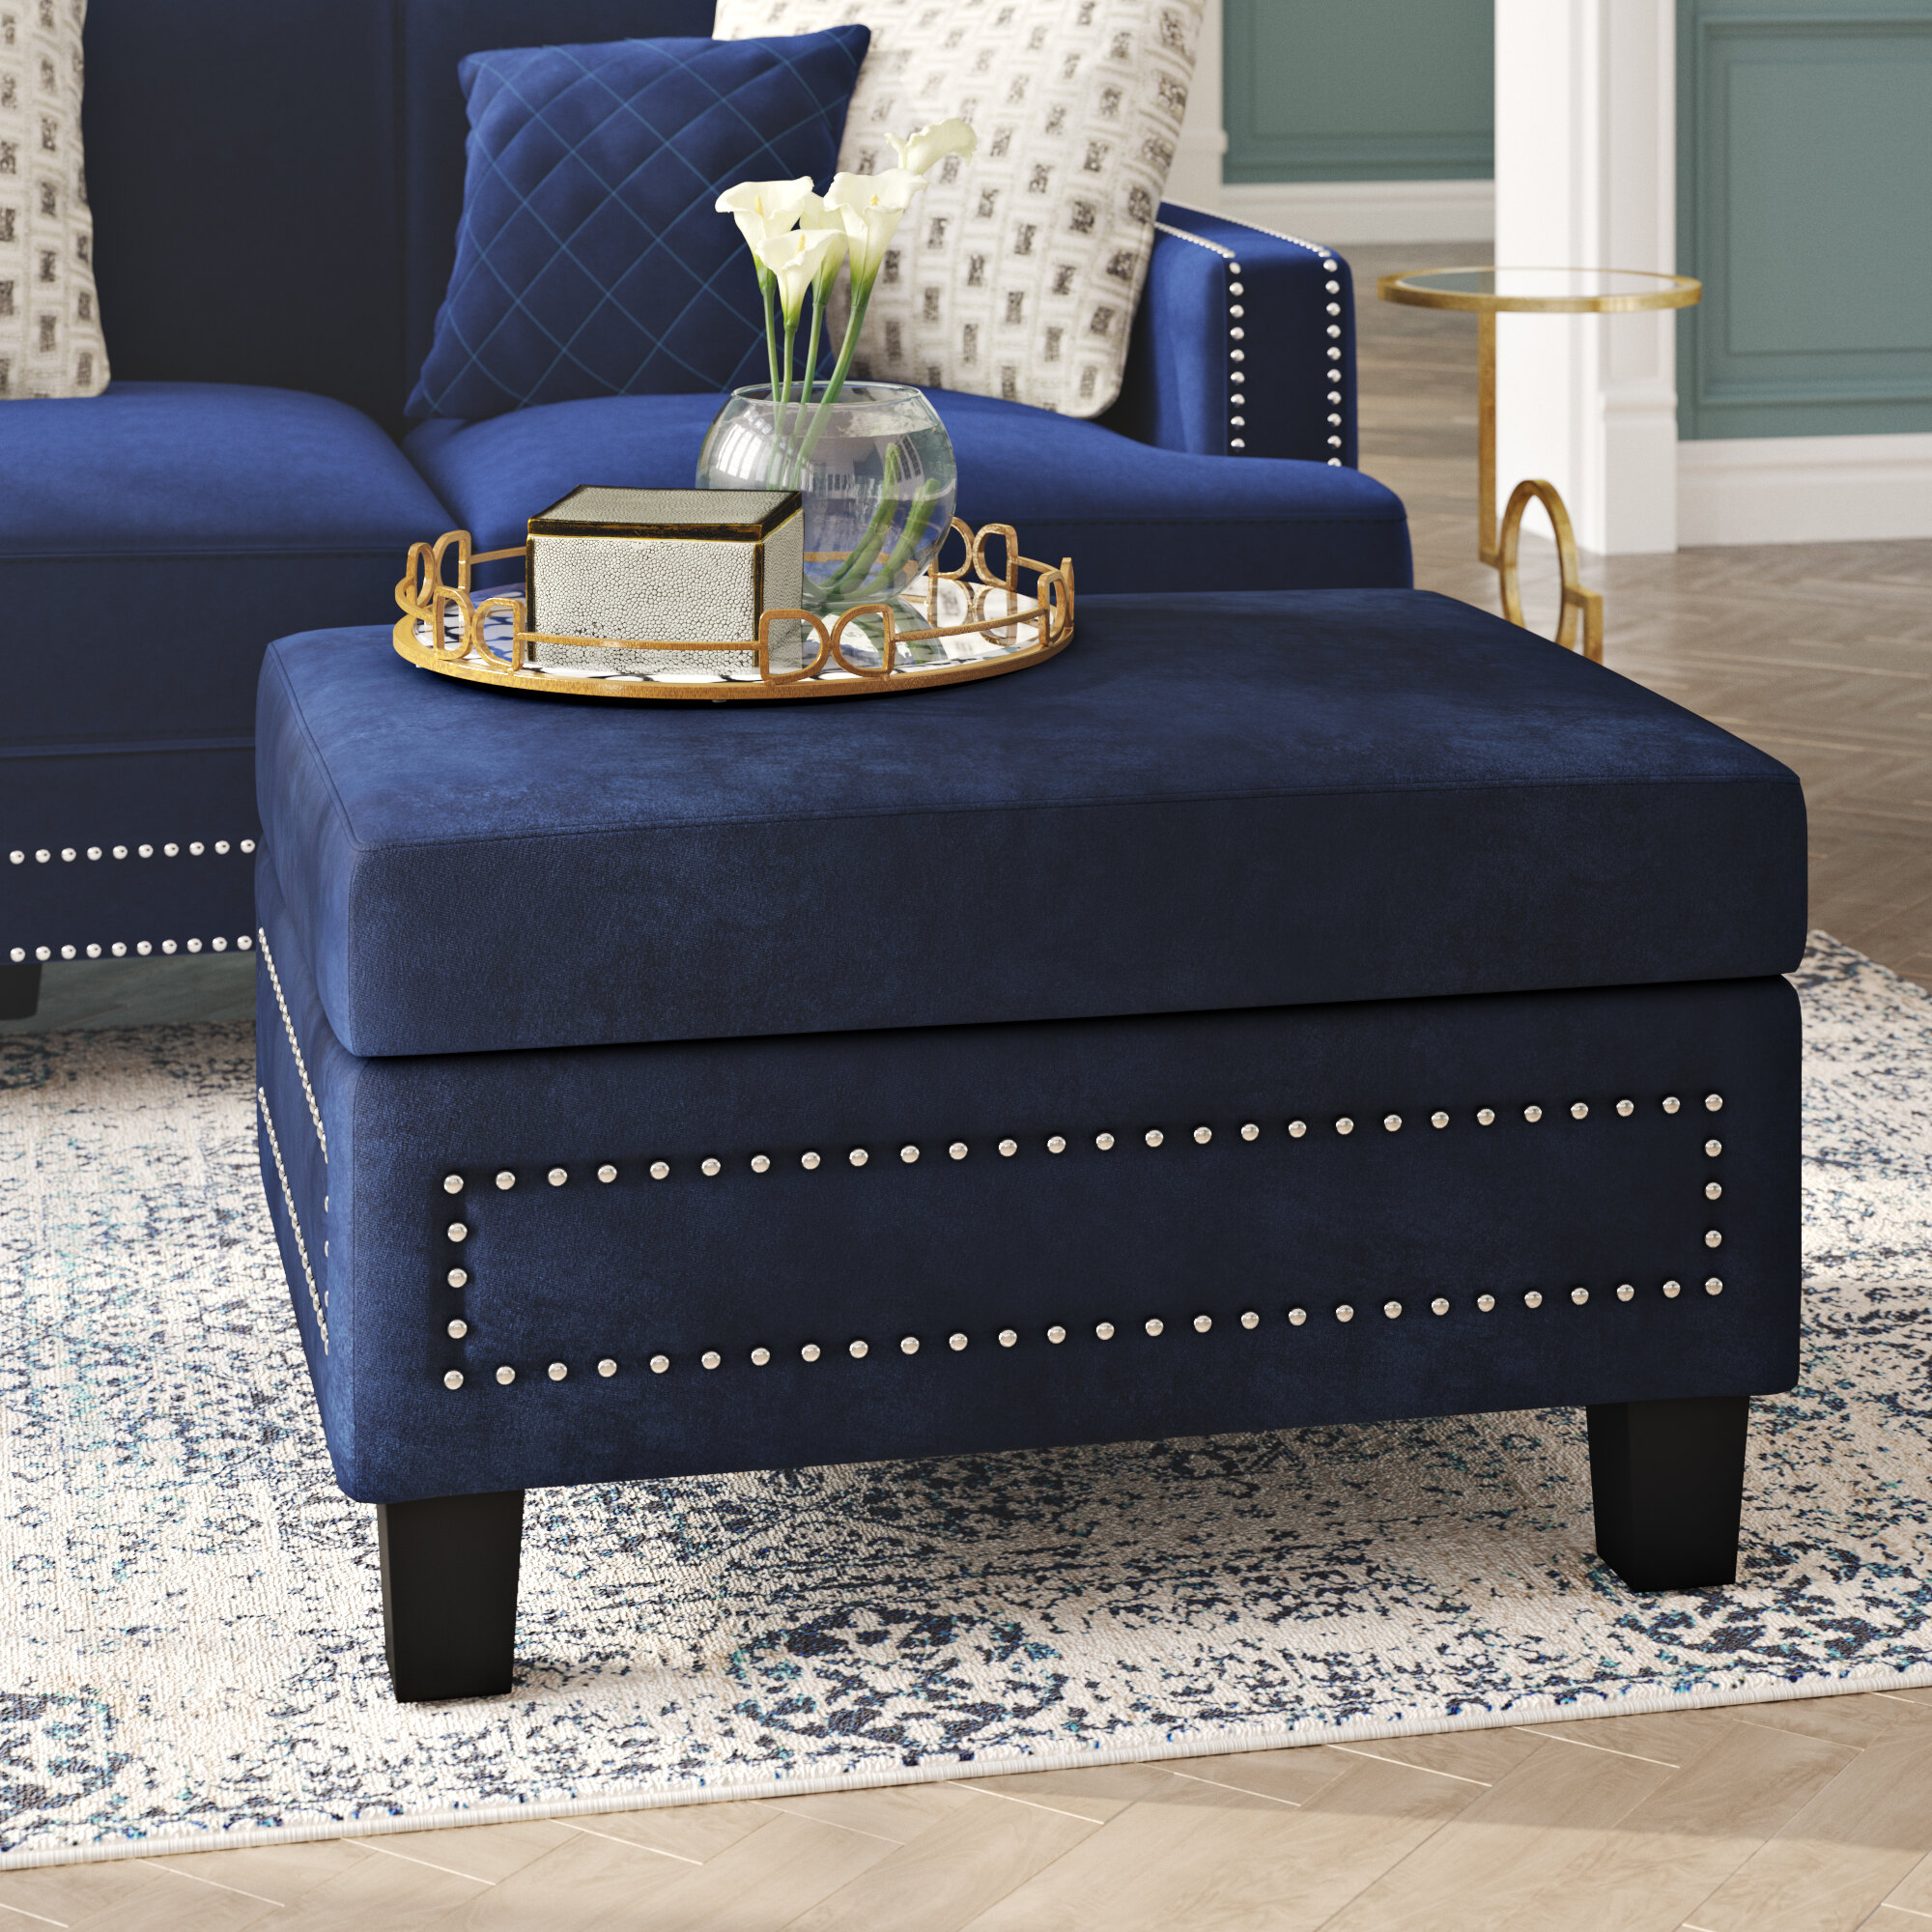 Tremendous Kia Storage Ottoman Alphanode Cool Chair Designs And Ideas Alphanodeonline